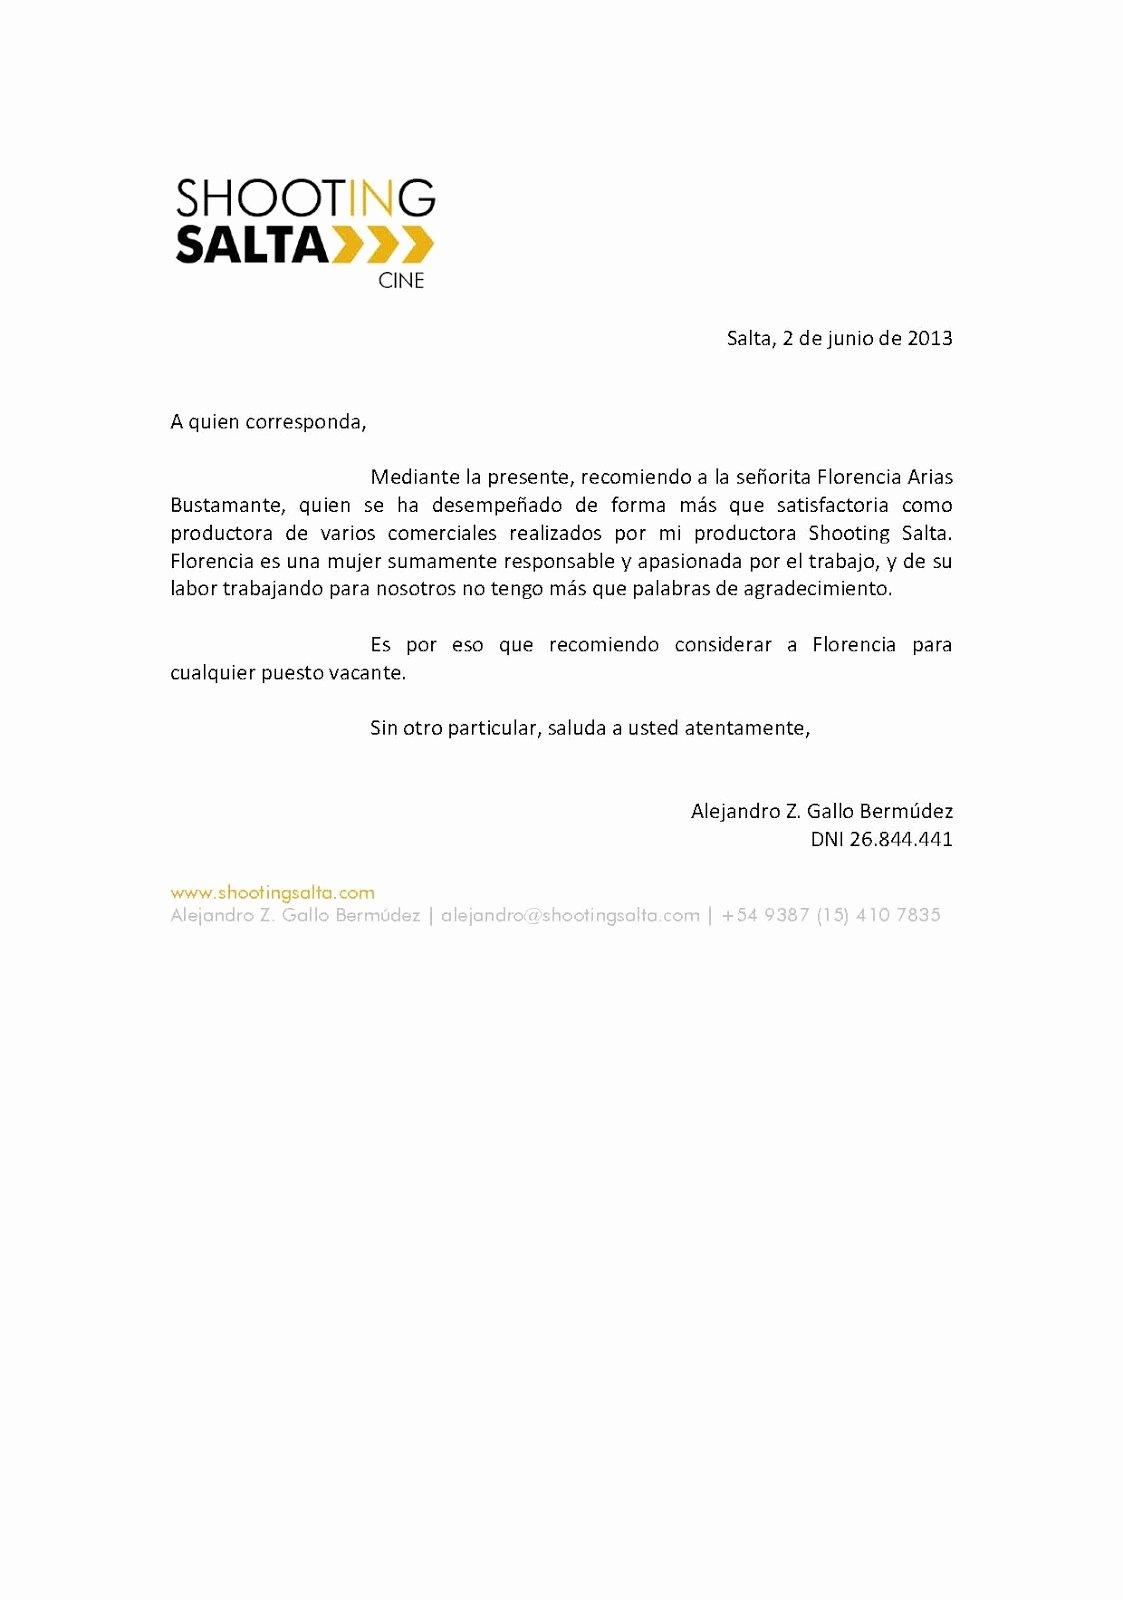 John Nash Recommendation Letter New Carta De Re Endacin Personal O Hacerla Con Ejemplos